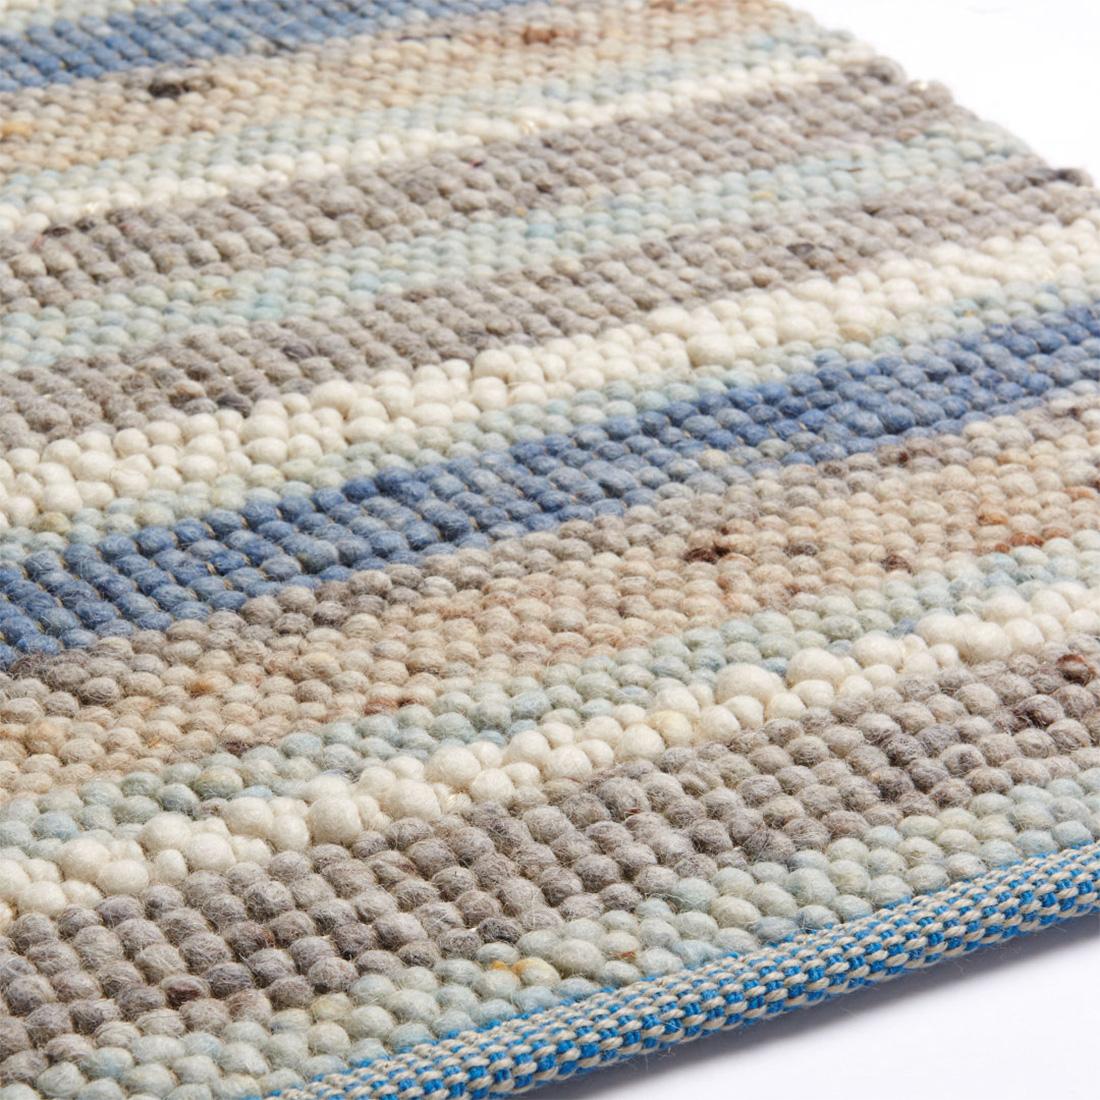 Vloerkleed Brinker Greenland Stripes 1045 | 170 x 230 cm